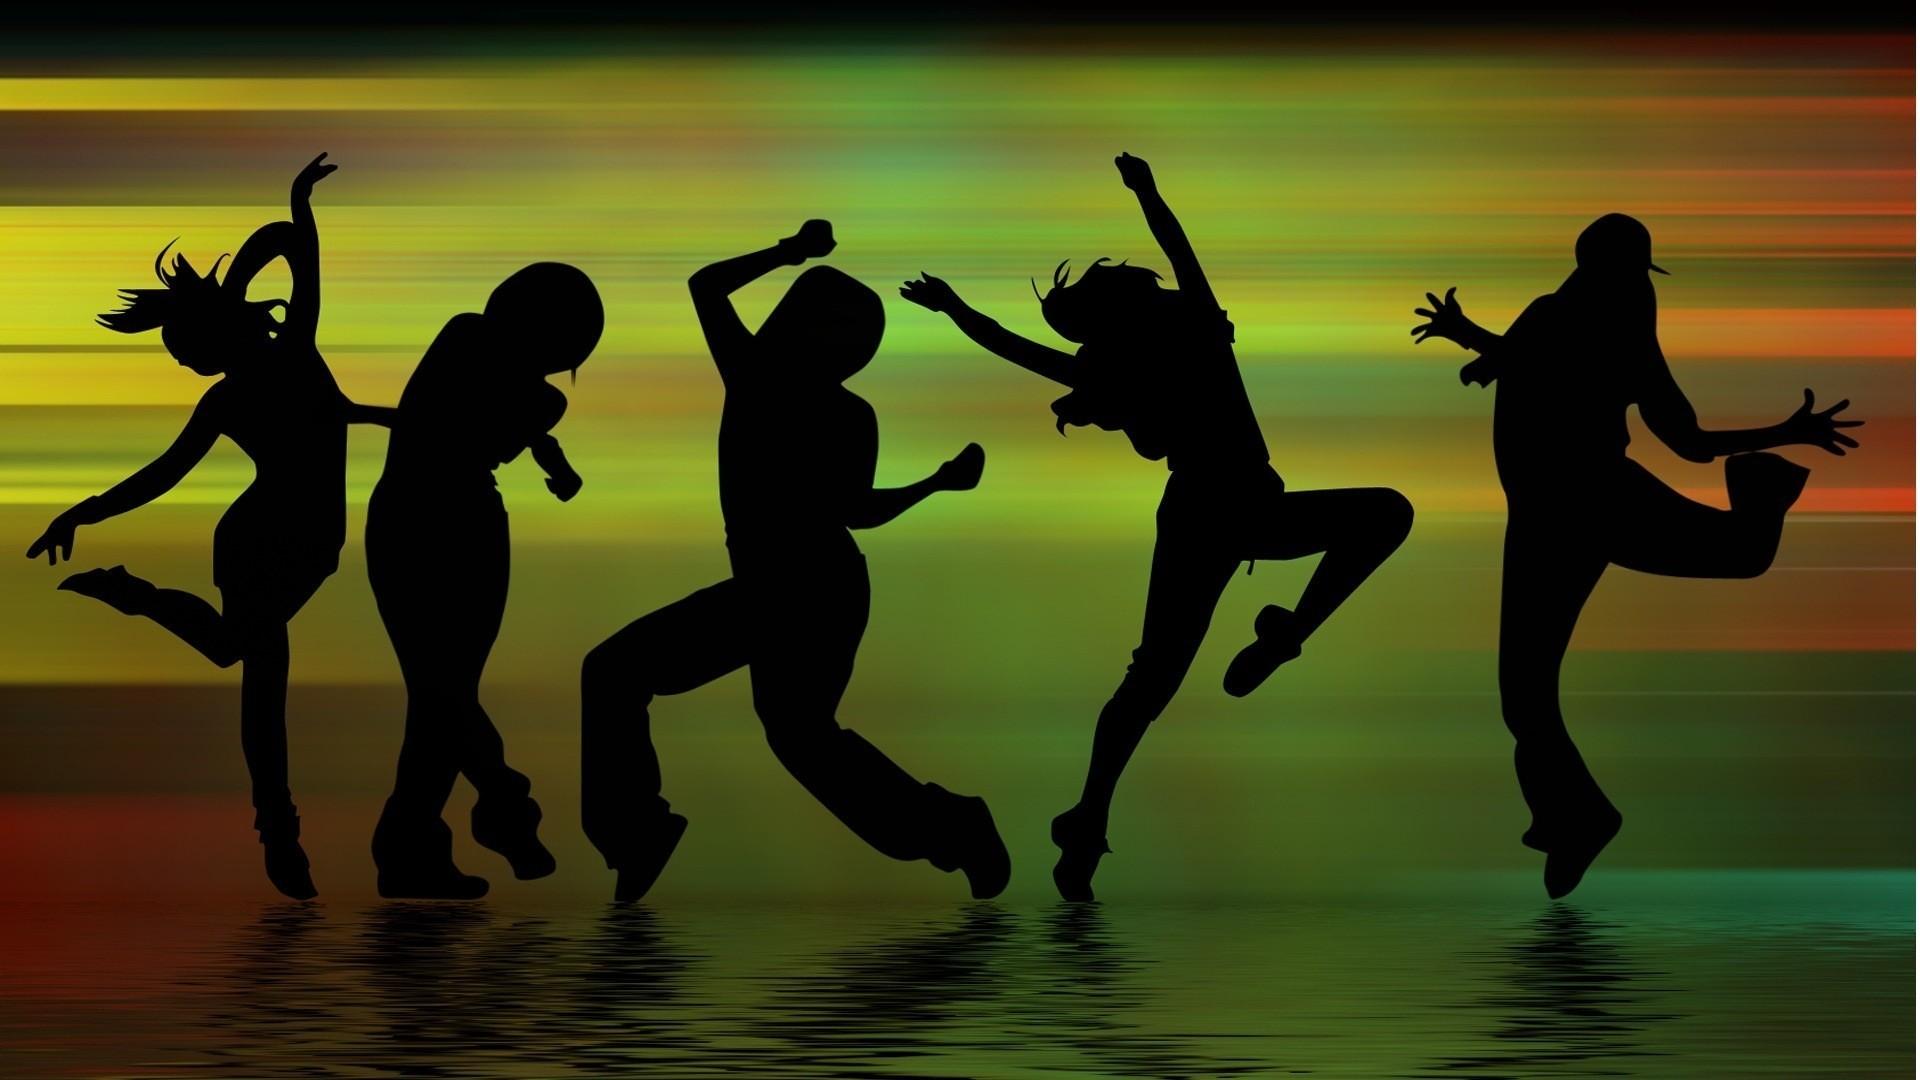 Music and Dance Wallpapers HD, HD Desktop Wallpapers